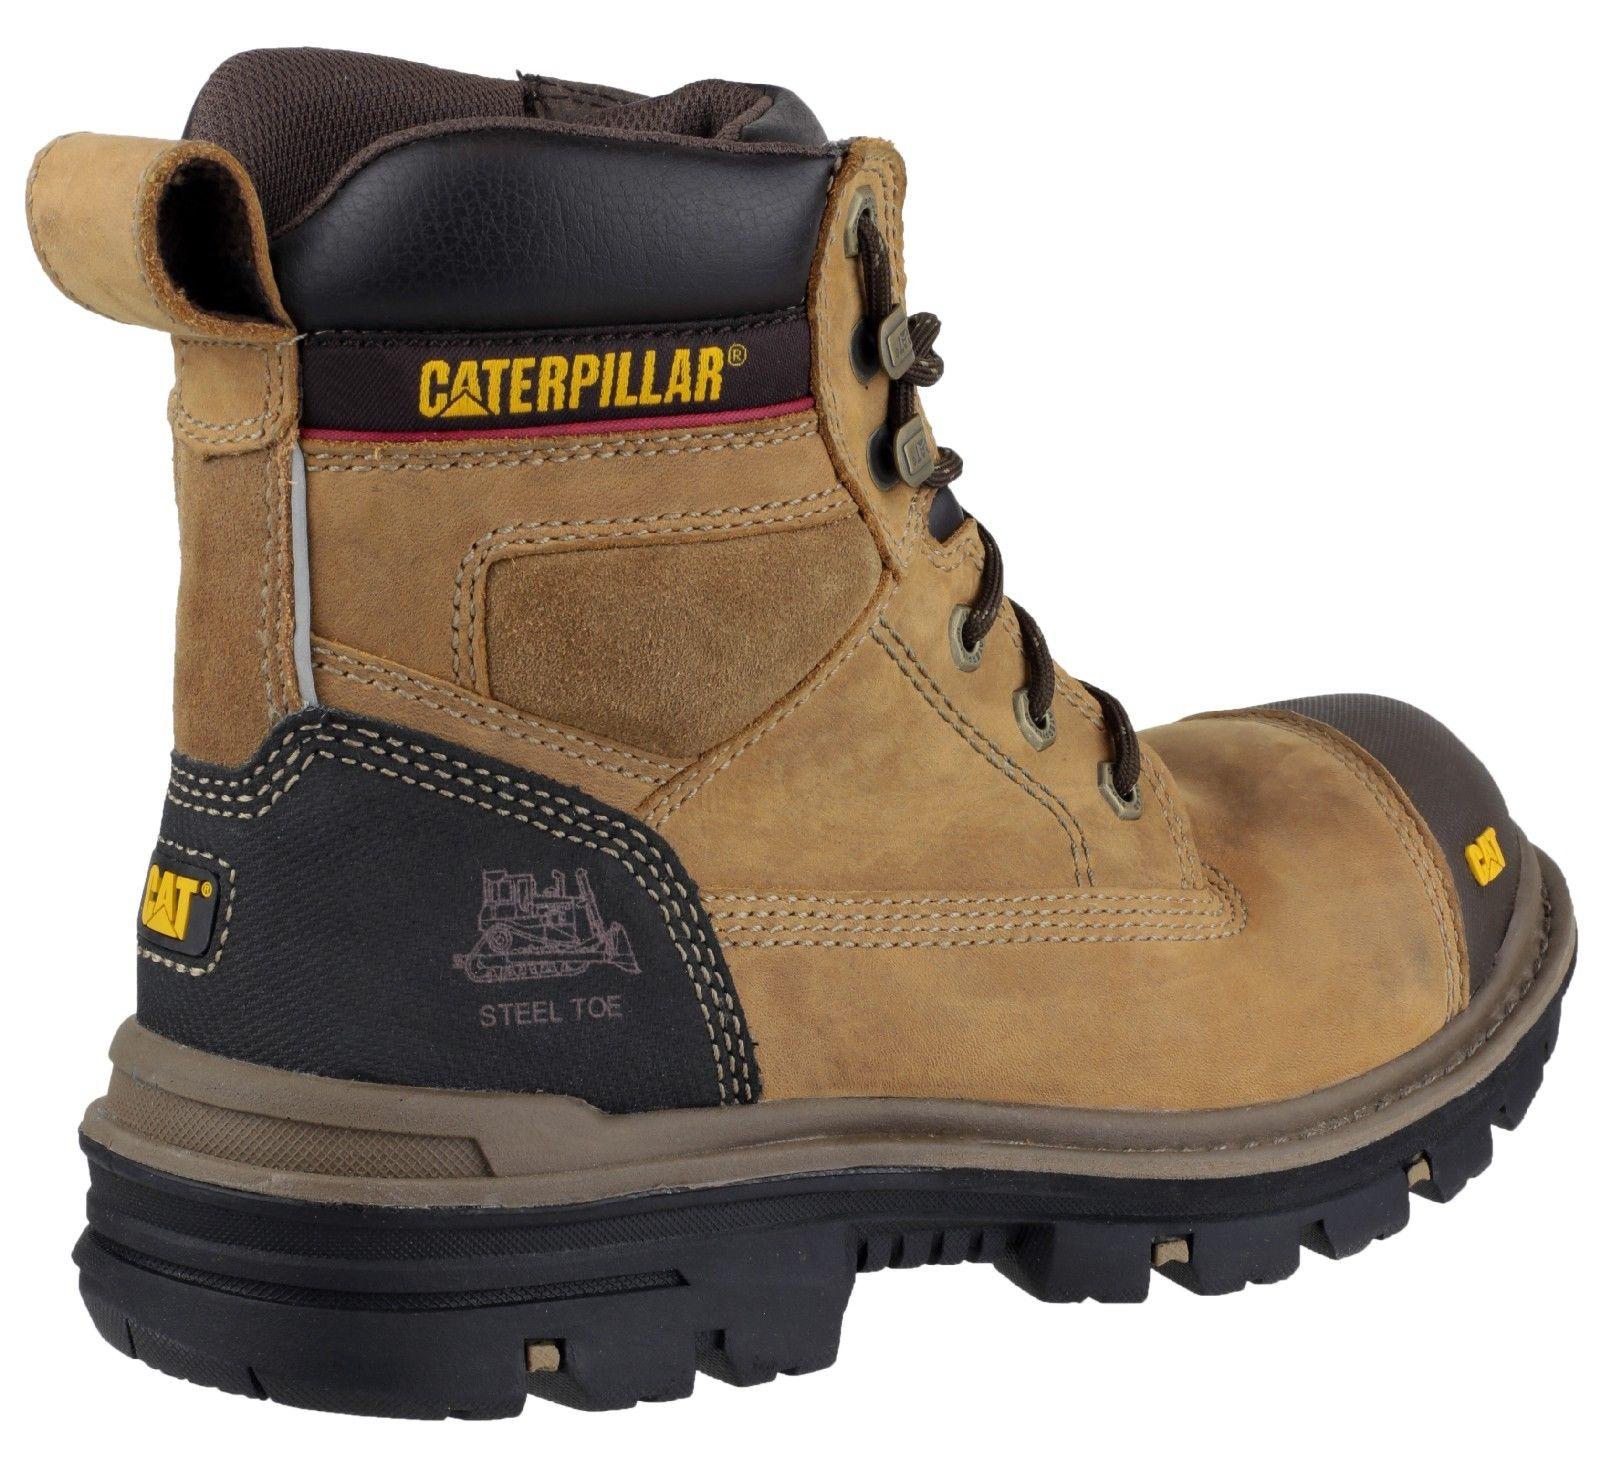 Caterpillar Shoes Mens Uk